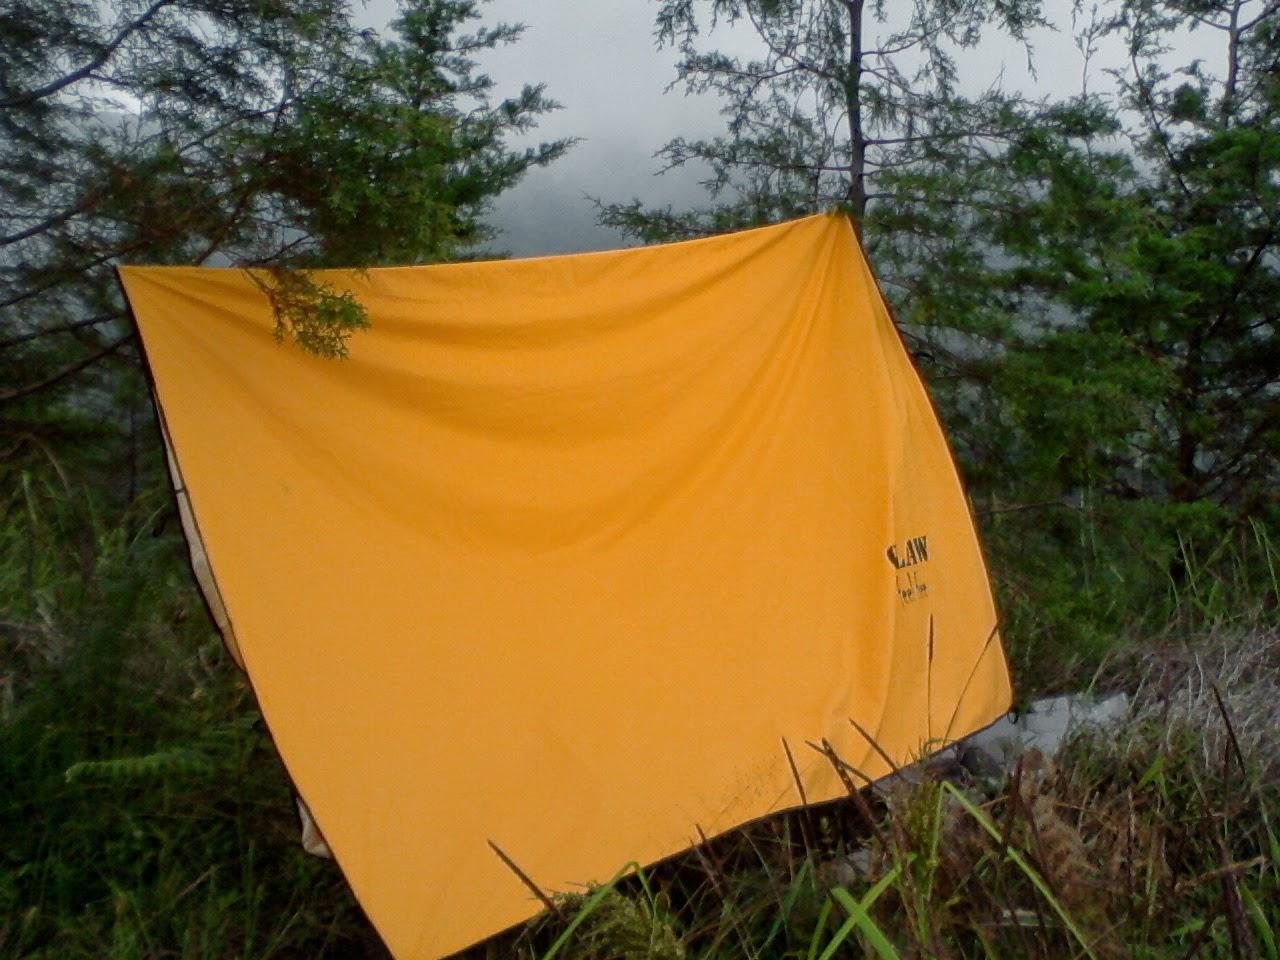 Daftar Harga Sewa Tenda Dan Peralatan Camping Dieng